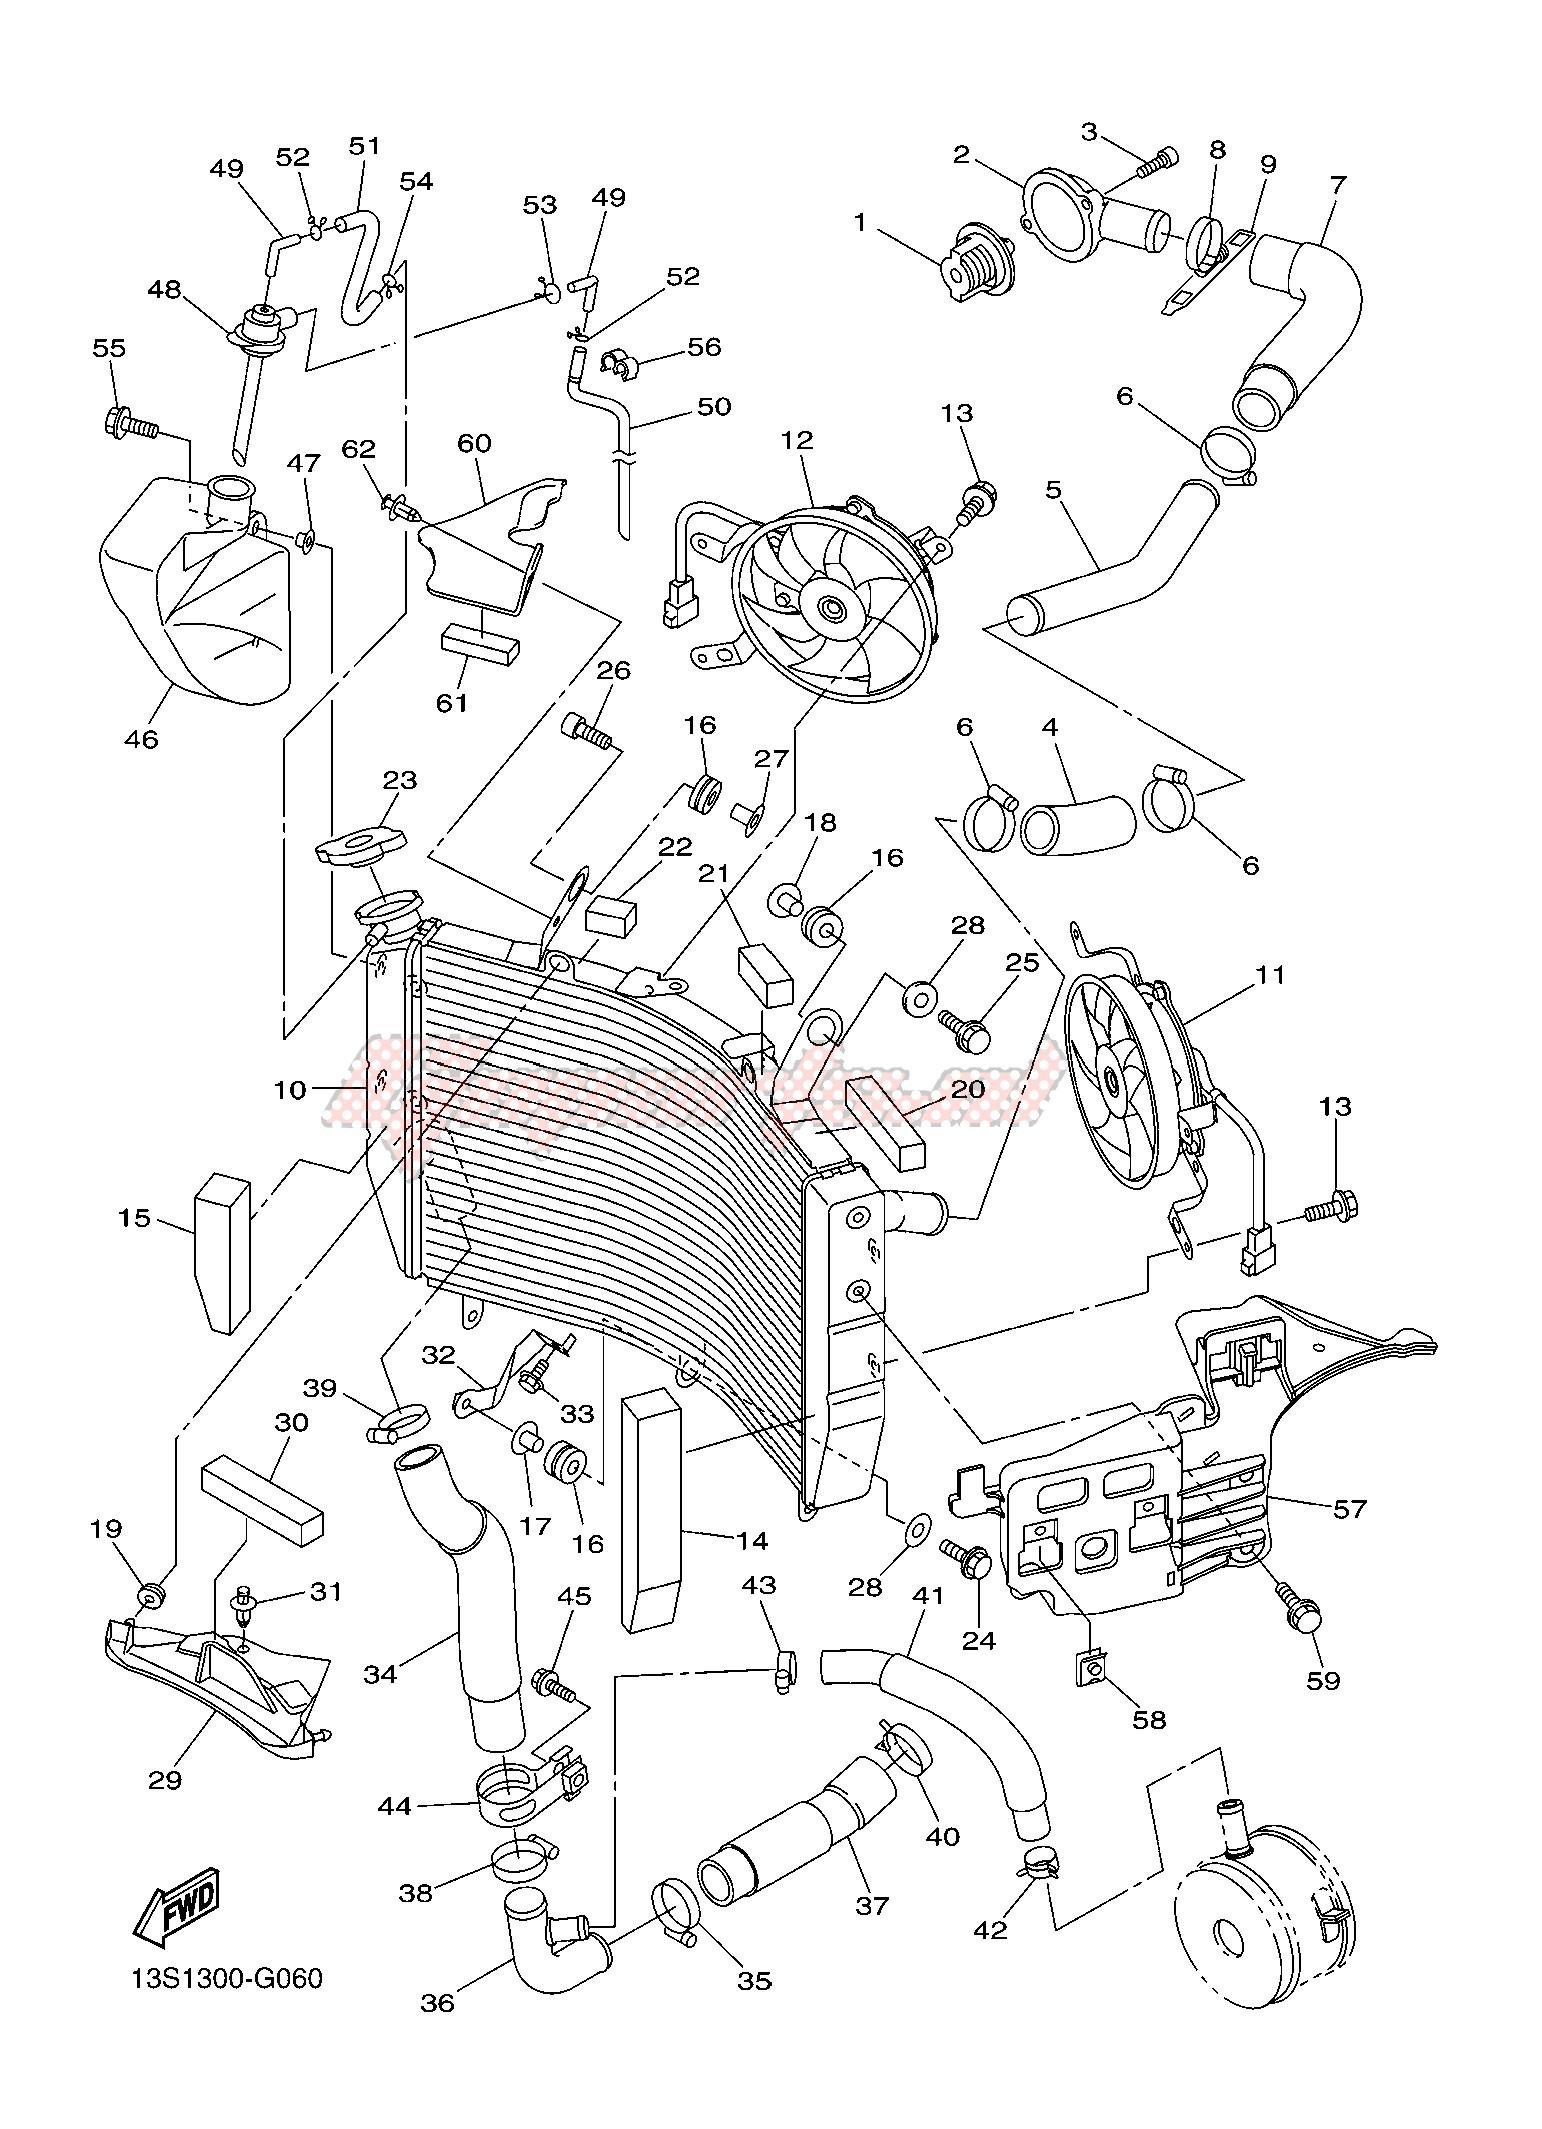 [DIAGRAM_5NL]  OEM RADIATOR & HOSE - (Yamaha [Motorcycle] YZF-R6 600 R6 (2CXE 2CXF) / 2015)  | Goparts | 2015 Moto Yamaha R6 Engine Diagram |  | Goparts